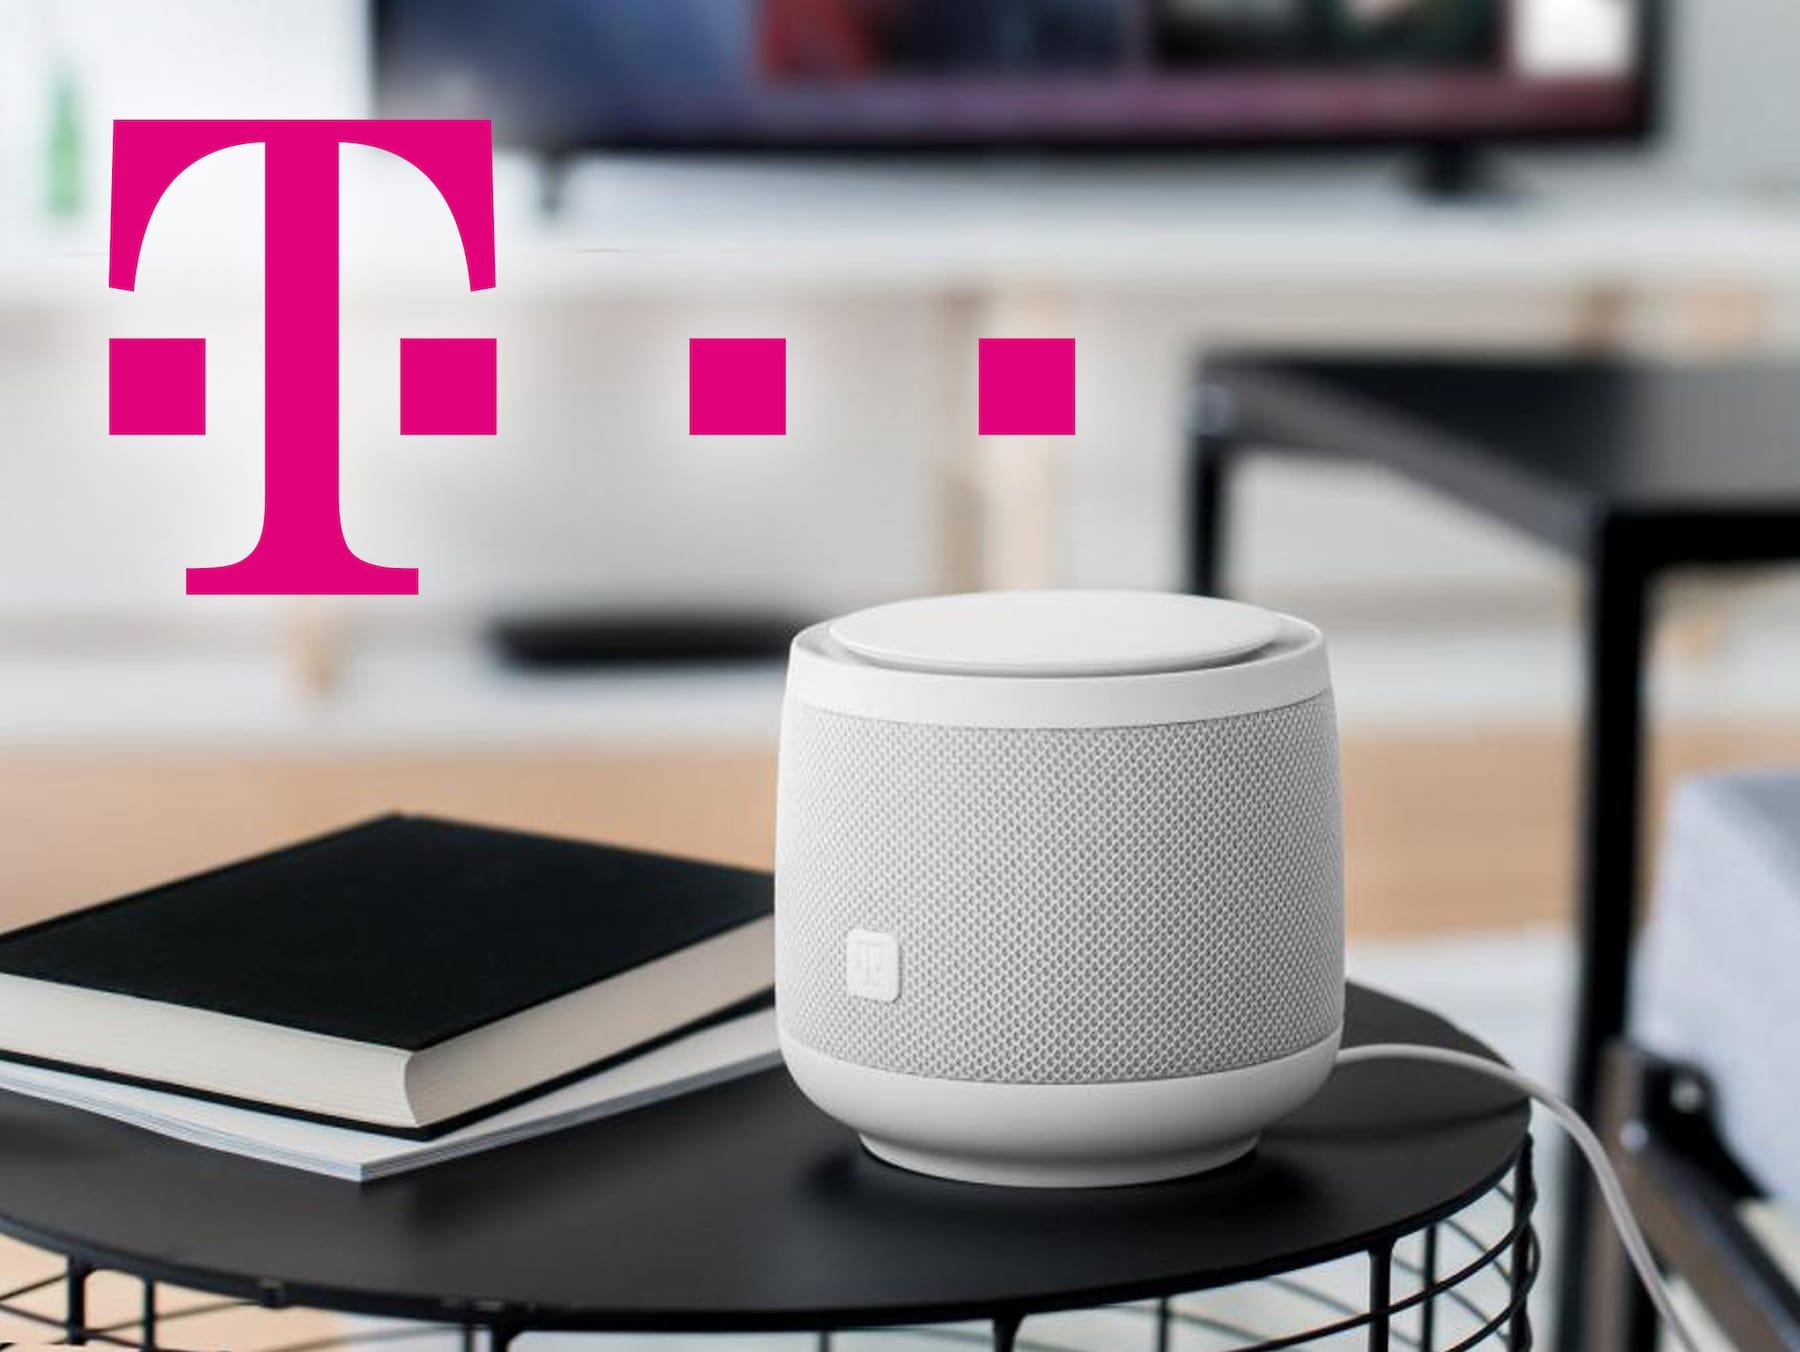 Telekom Smart Speaker: Hallo Magenta vor dem Start